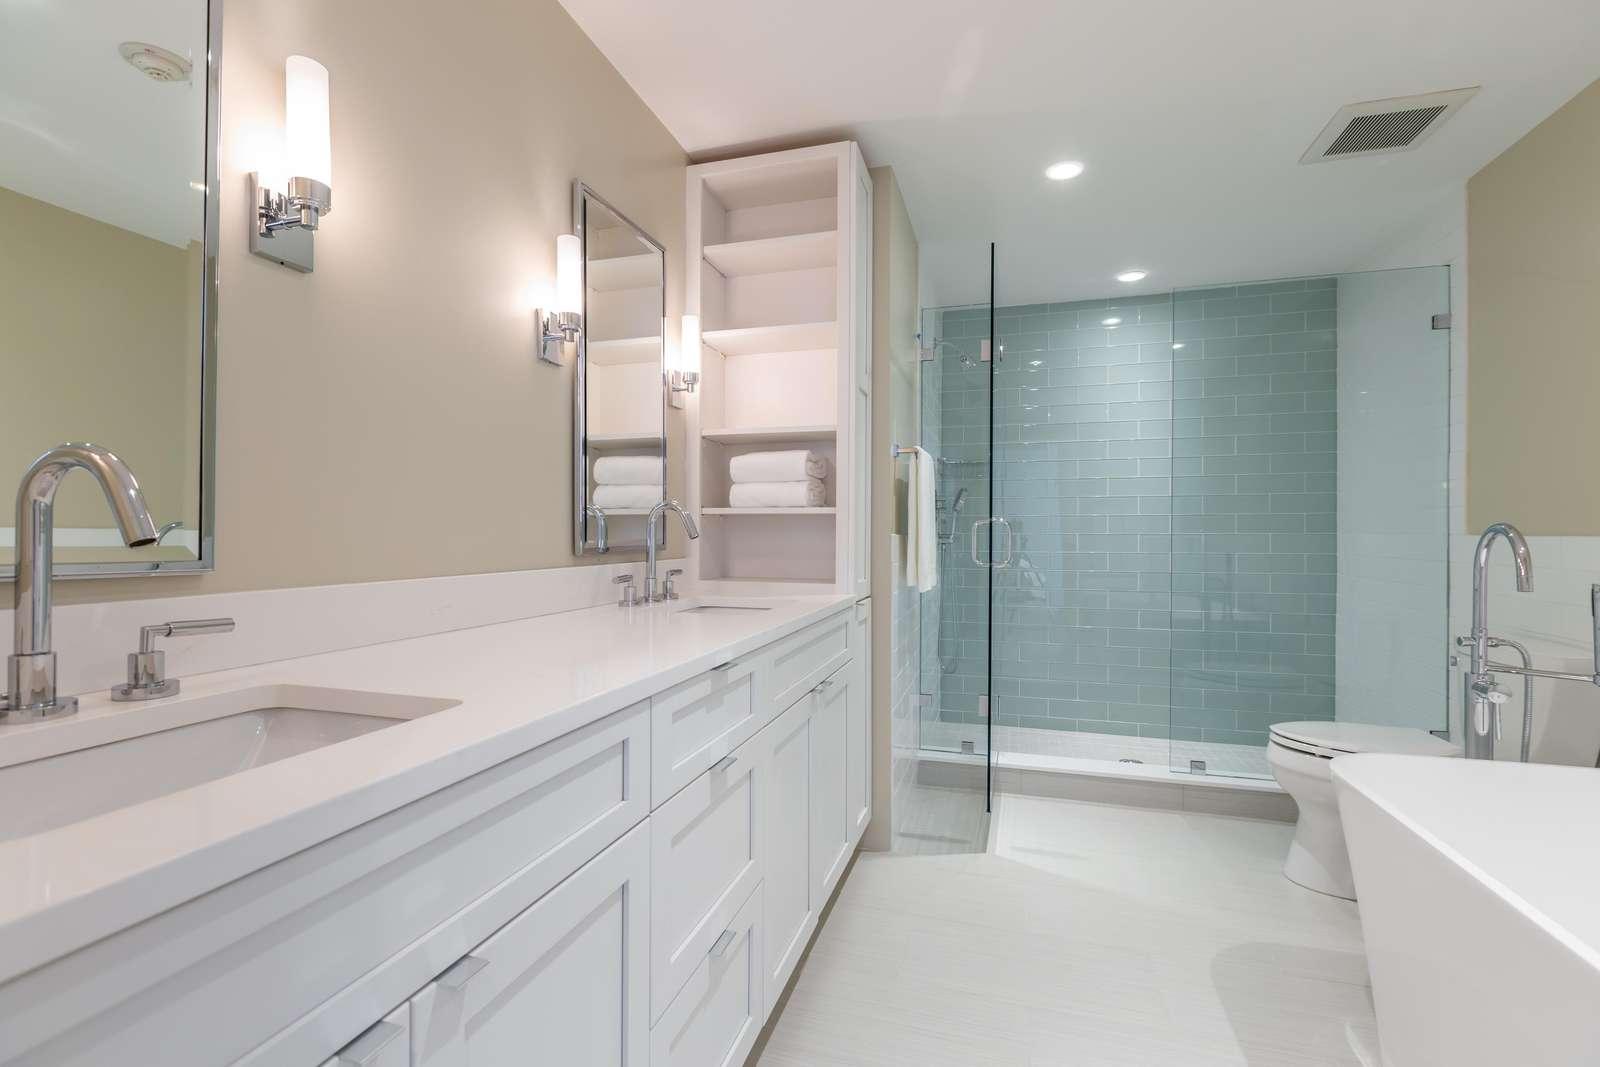 Master bathroom with double vanity, bath tub, elegant tile shower